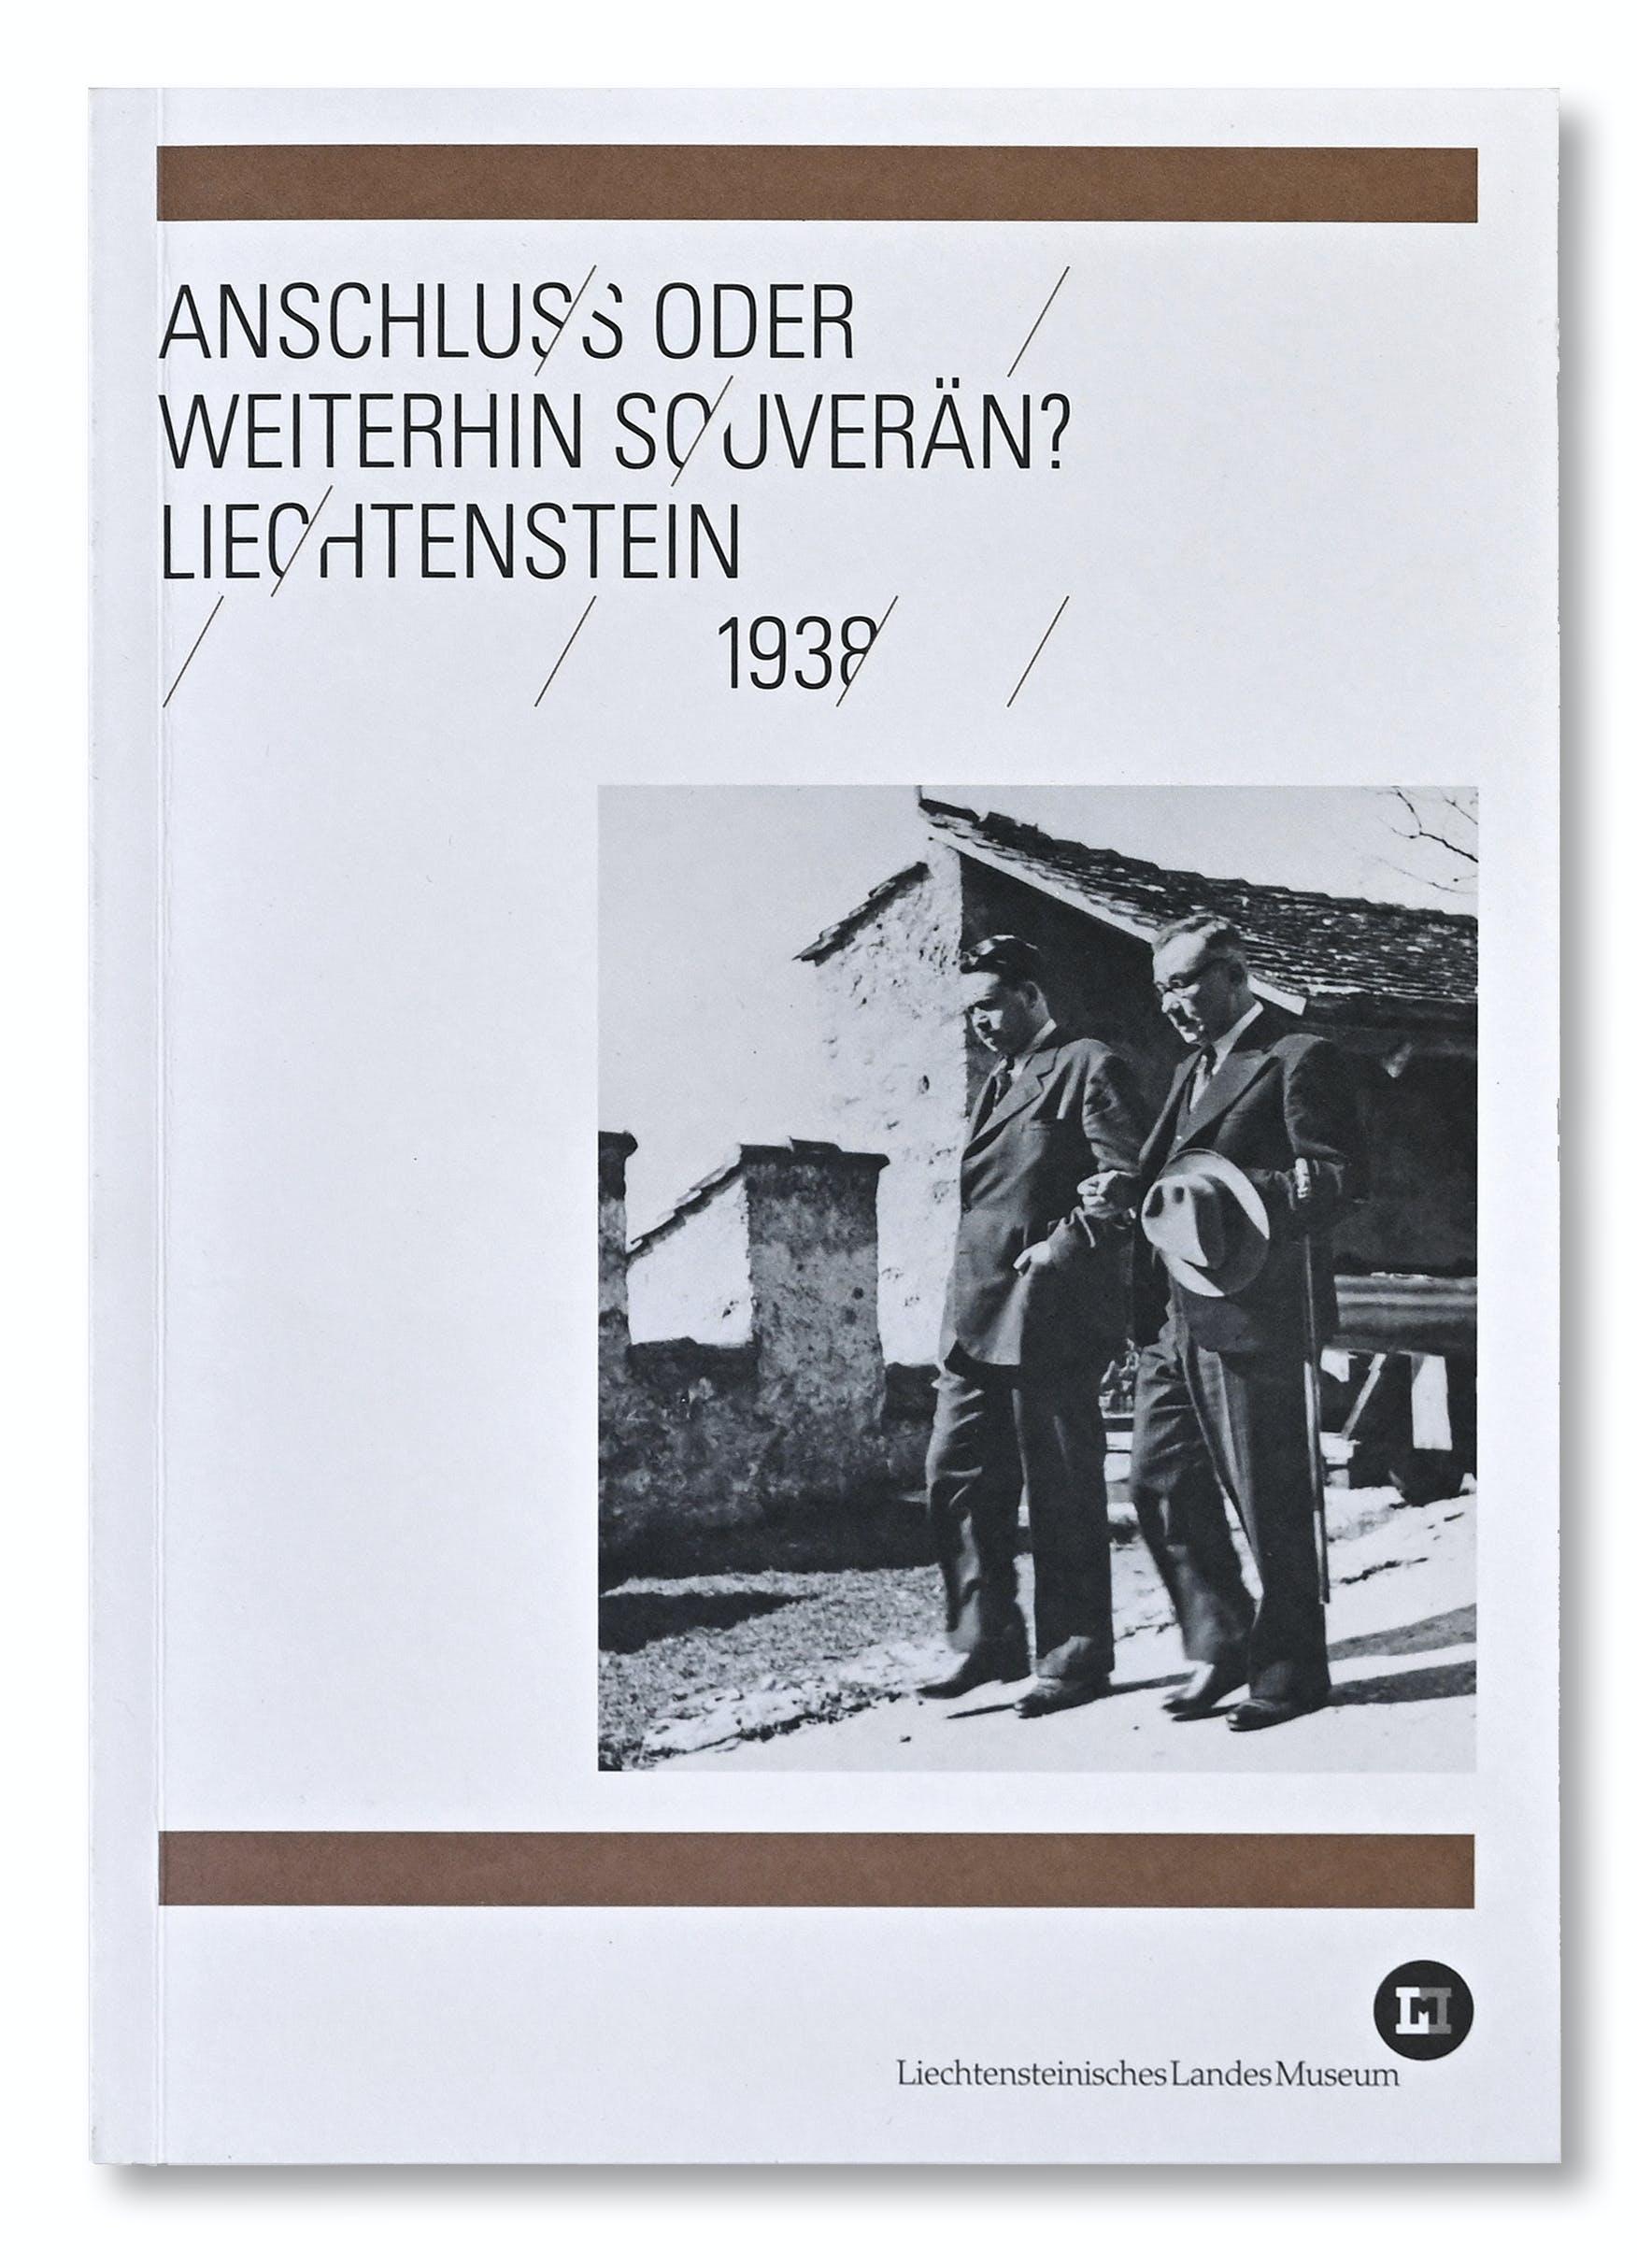 Publikation 1938 Anschluss oder weiterhin Souverän